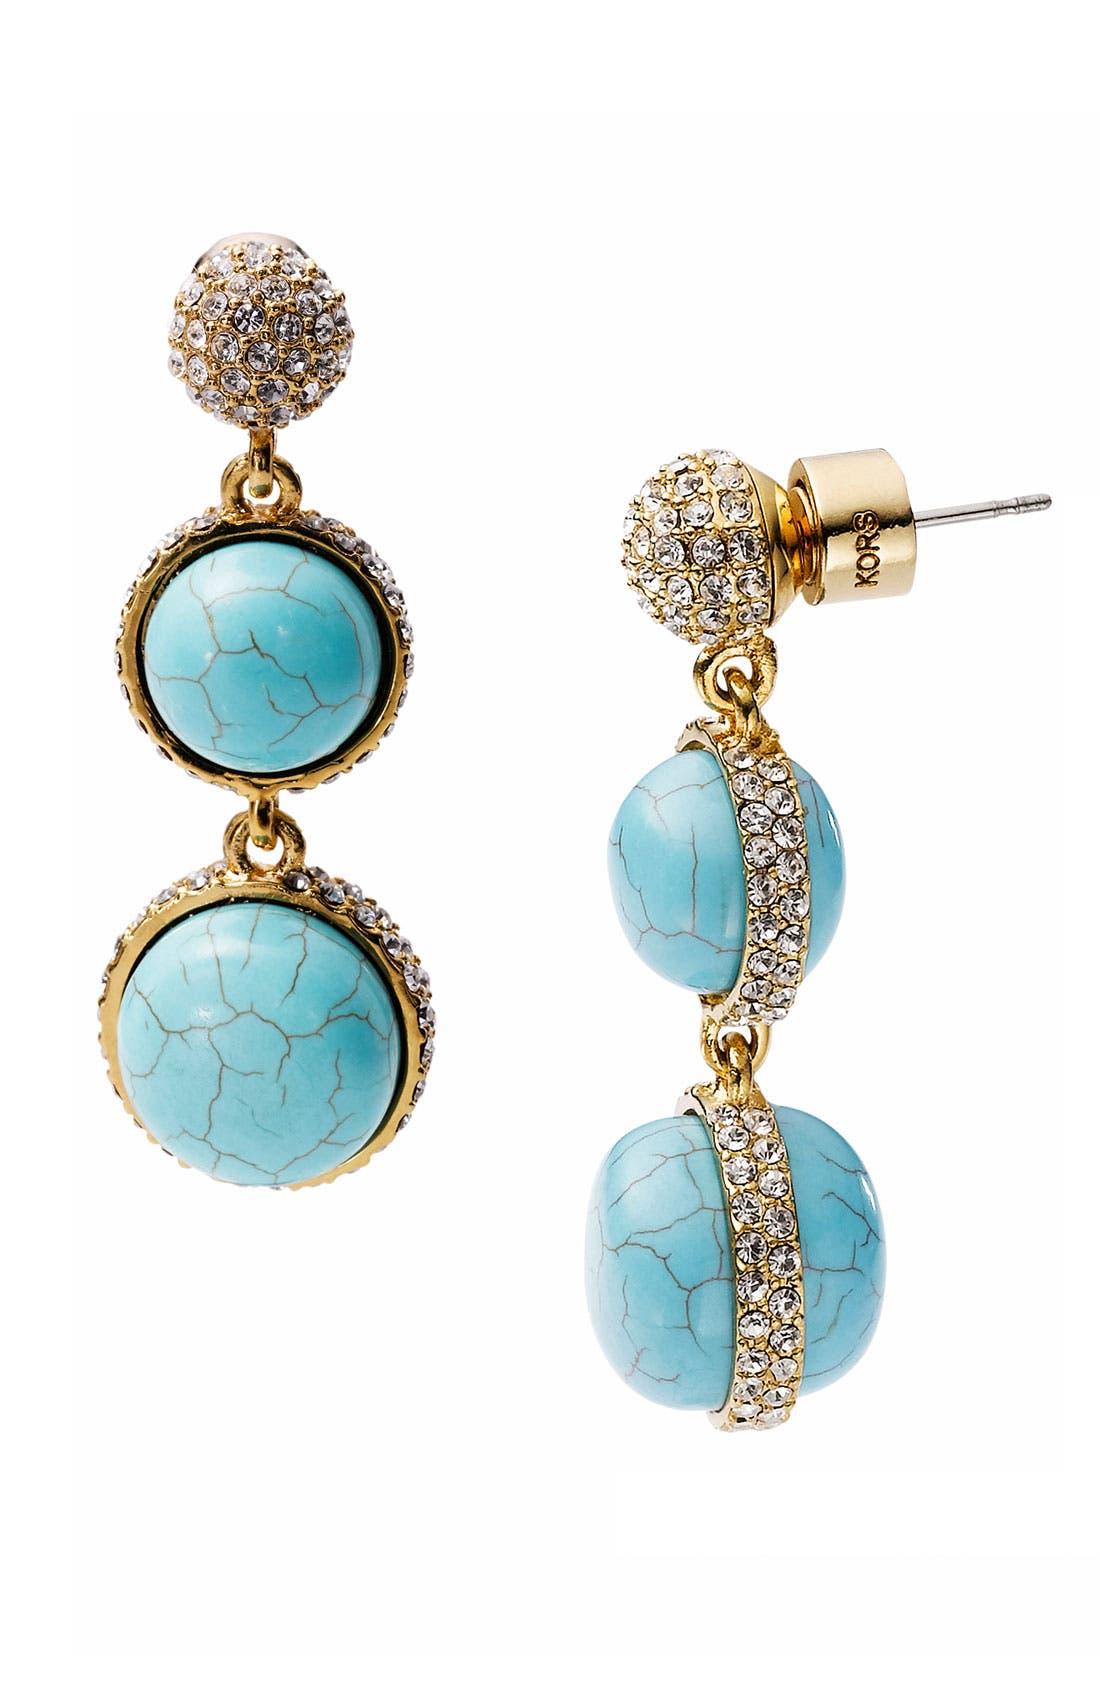 Main Image - Michael Kors 'Sleek Exotics' Double Drop Slice Earrings